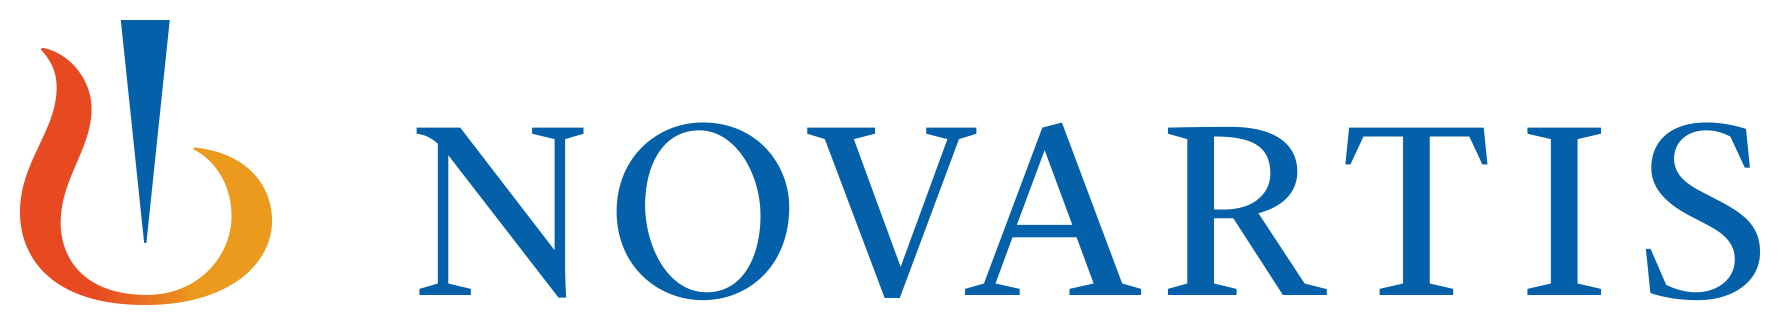 Novartiksen logo.